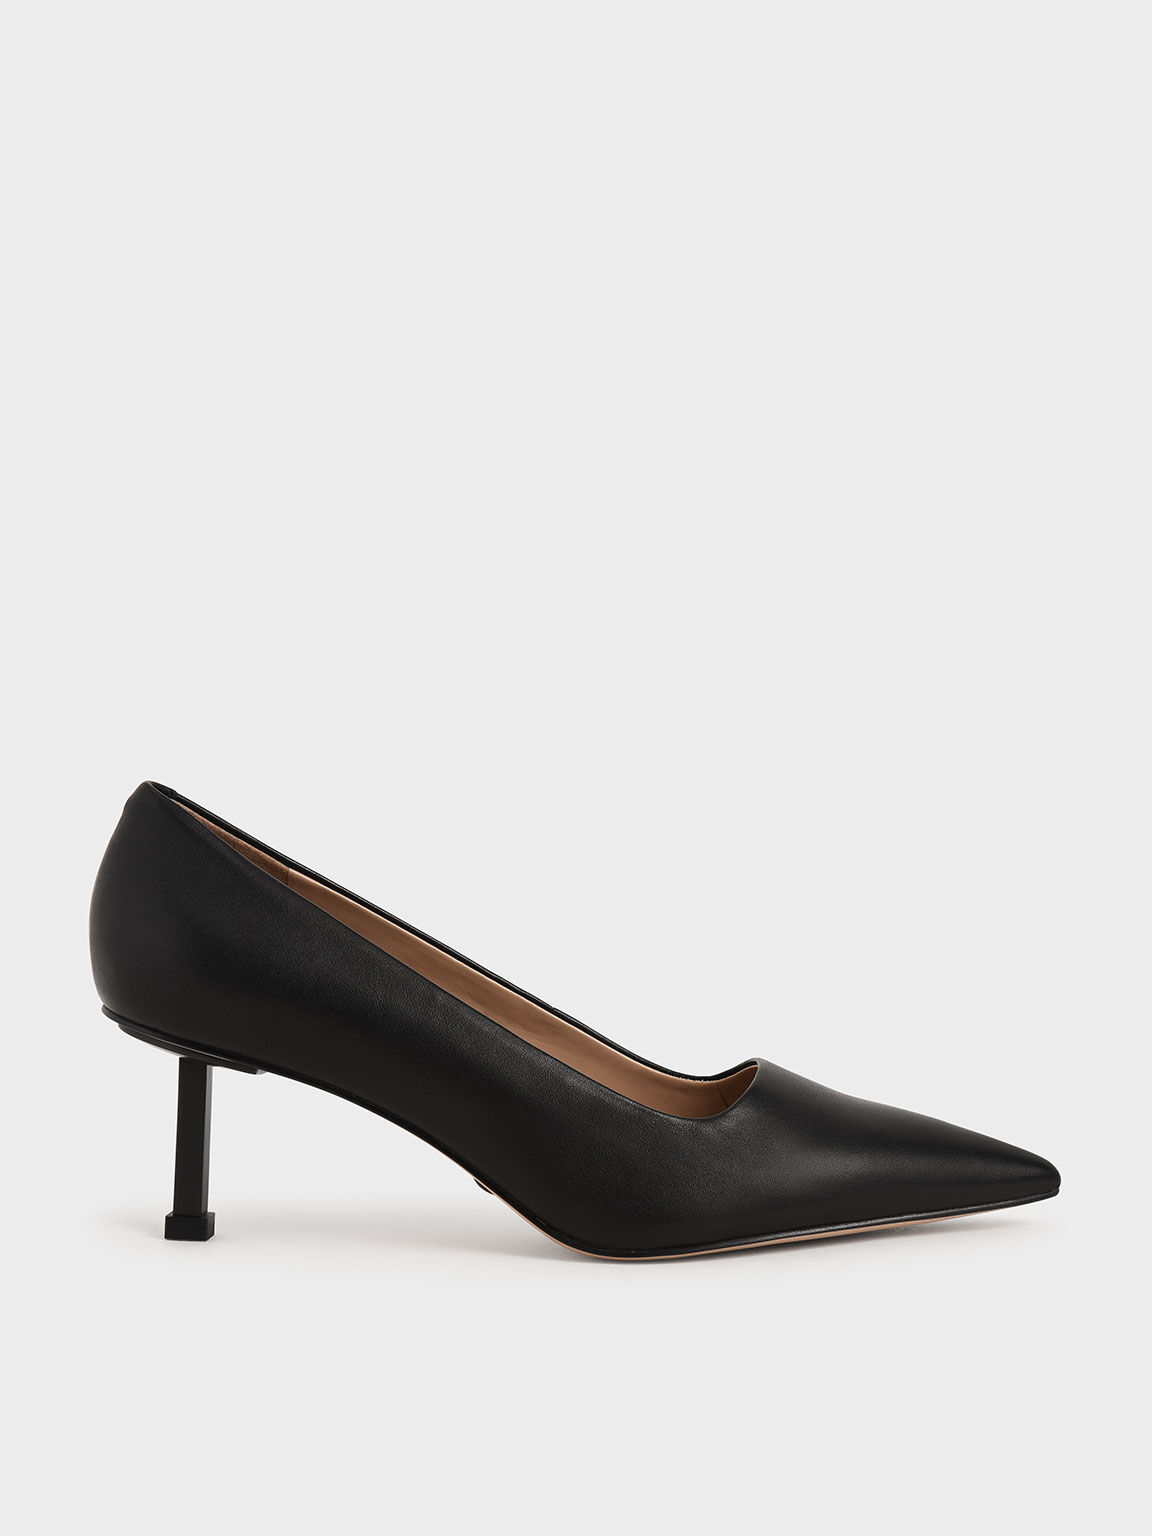 Leather Kitten Heel Court Shoes, Black, hi-res